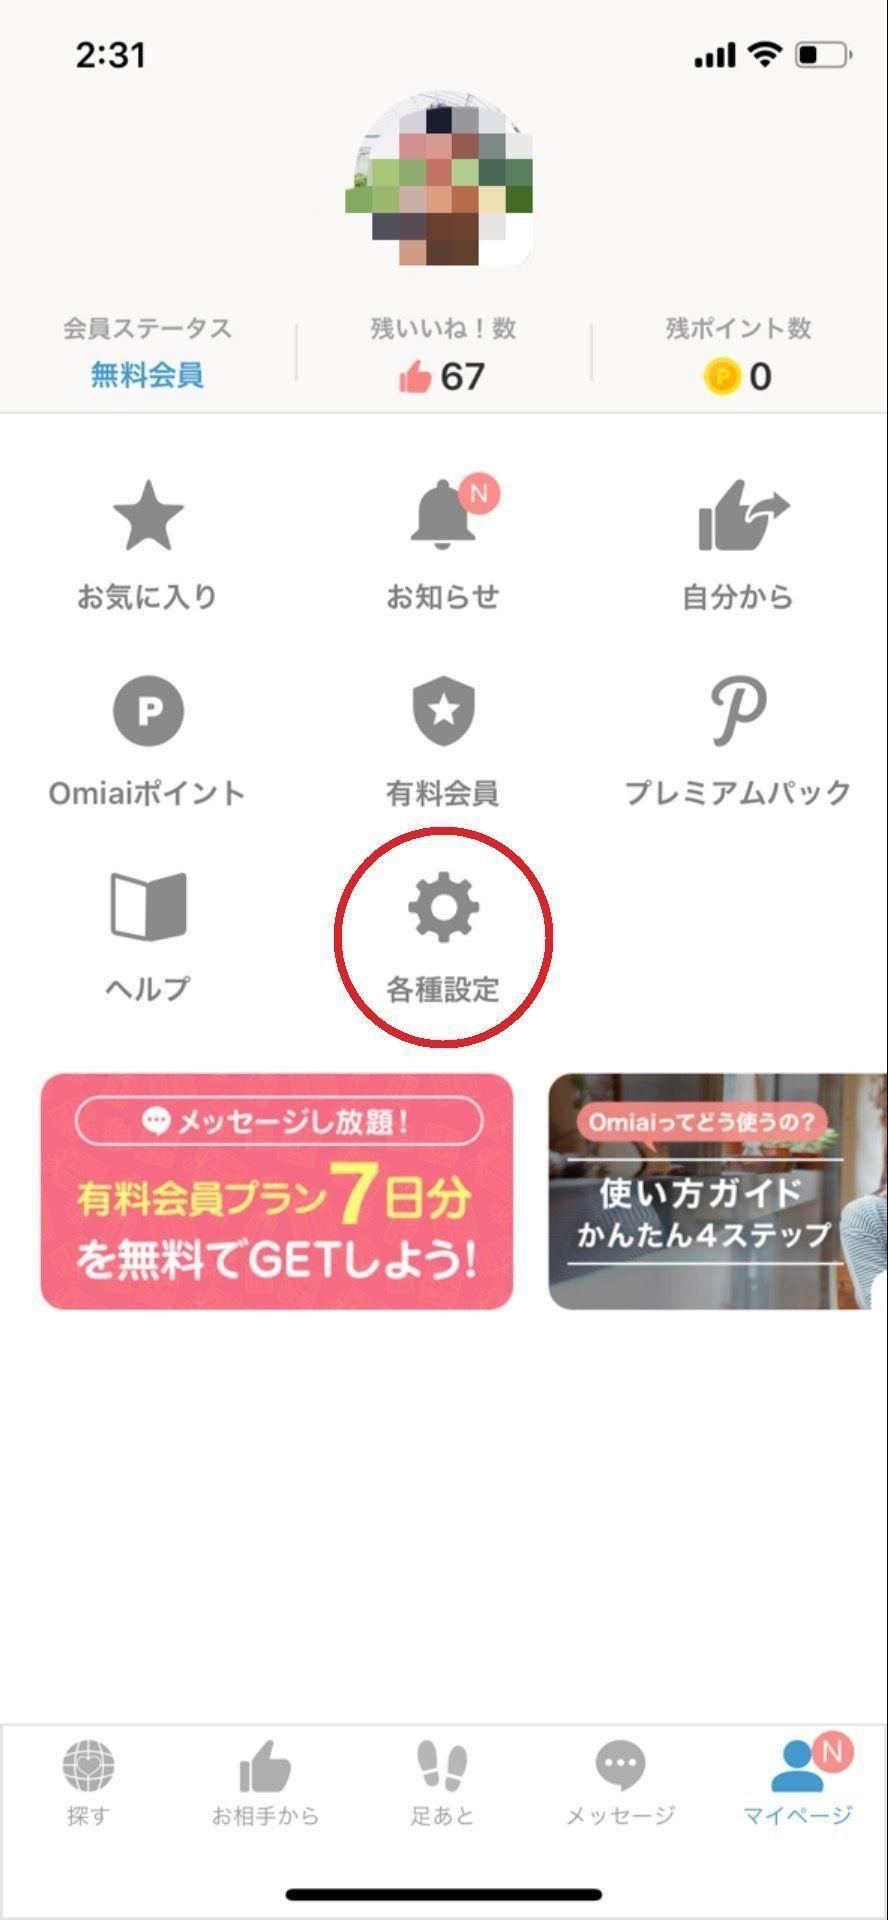 Omiai Omiaiで削除ユーザーを復活させる方法